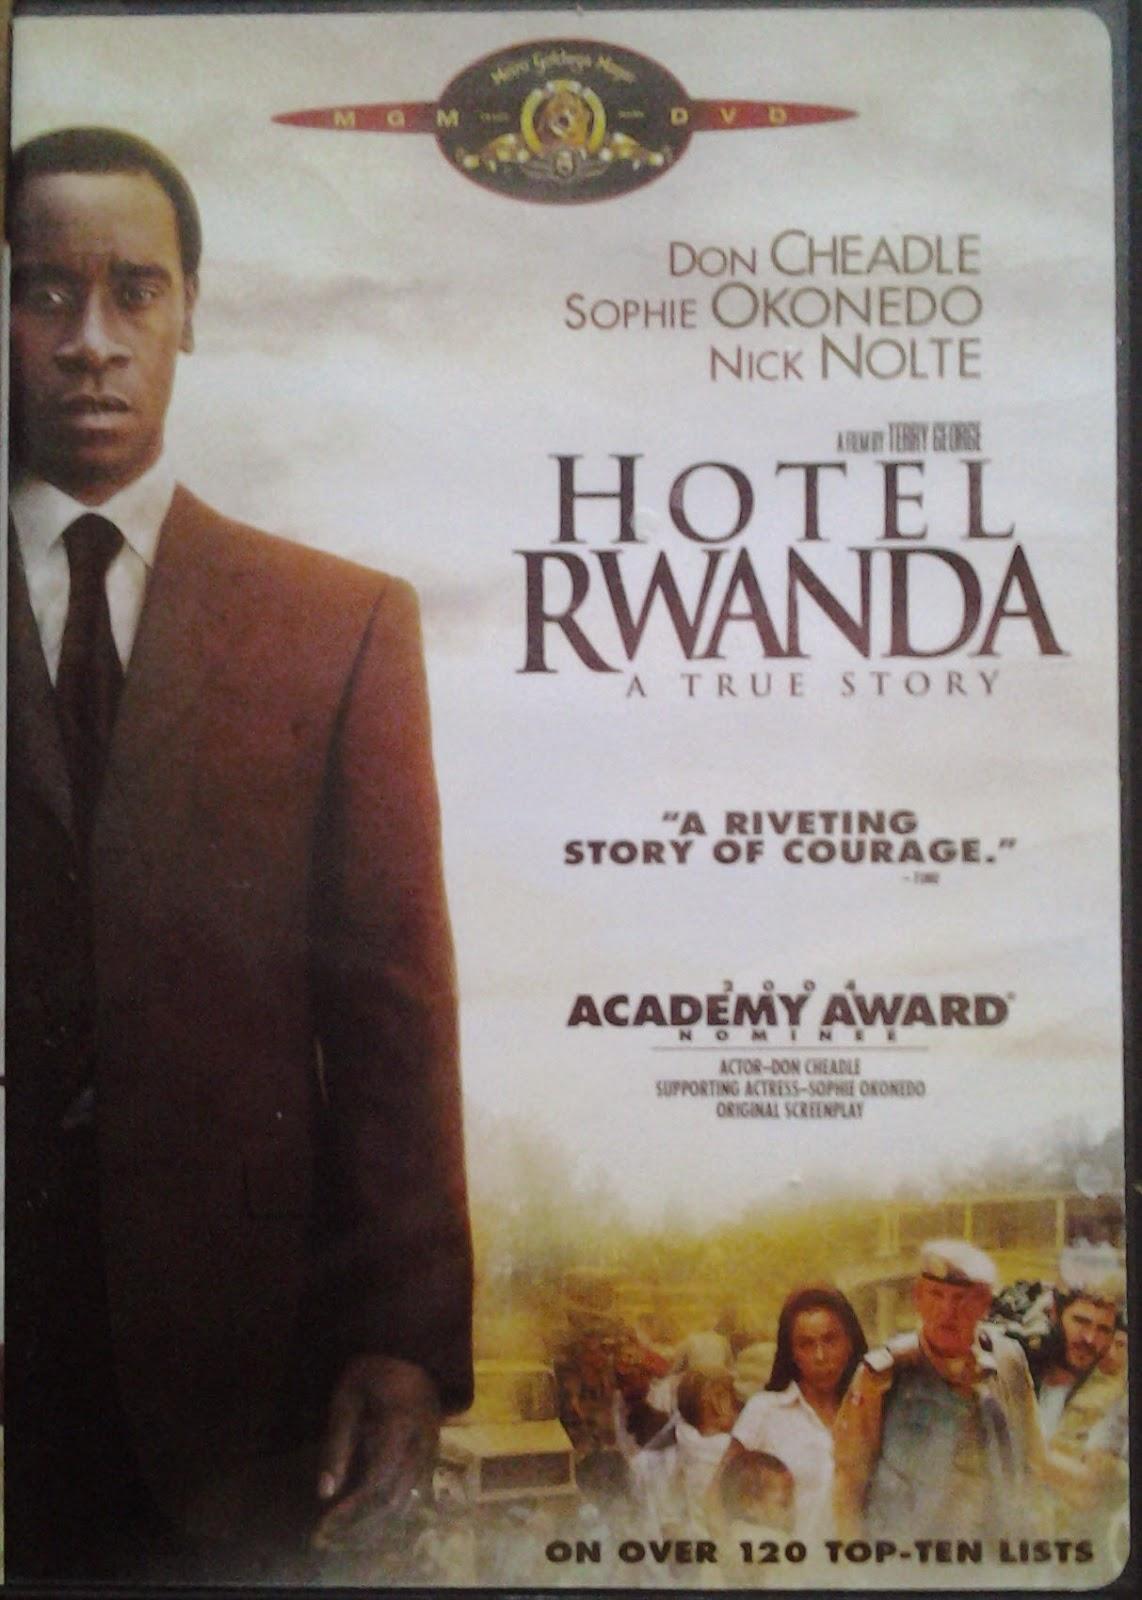 DVD Cover - Hotel Rwanda